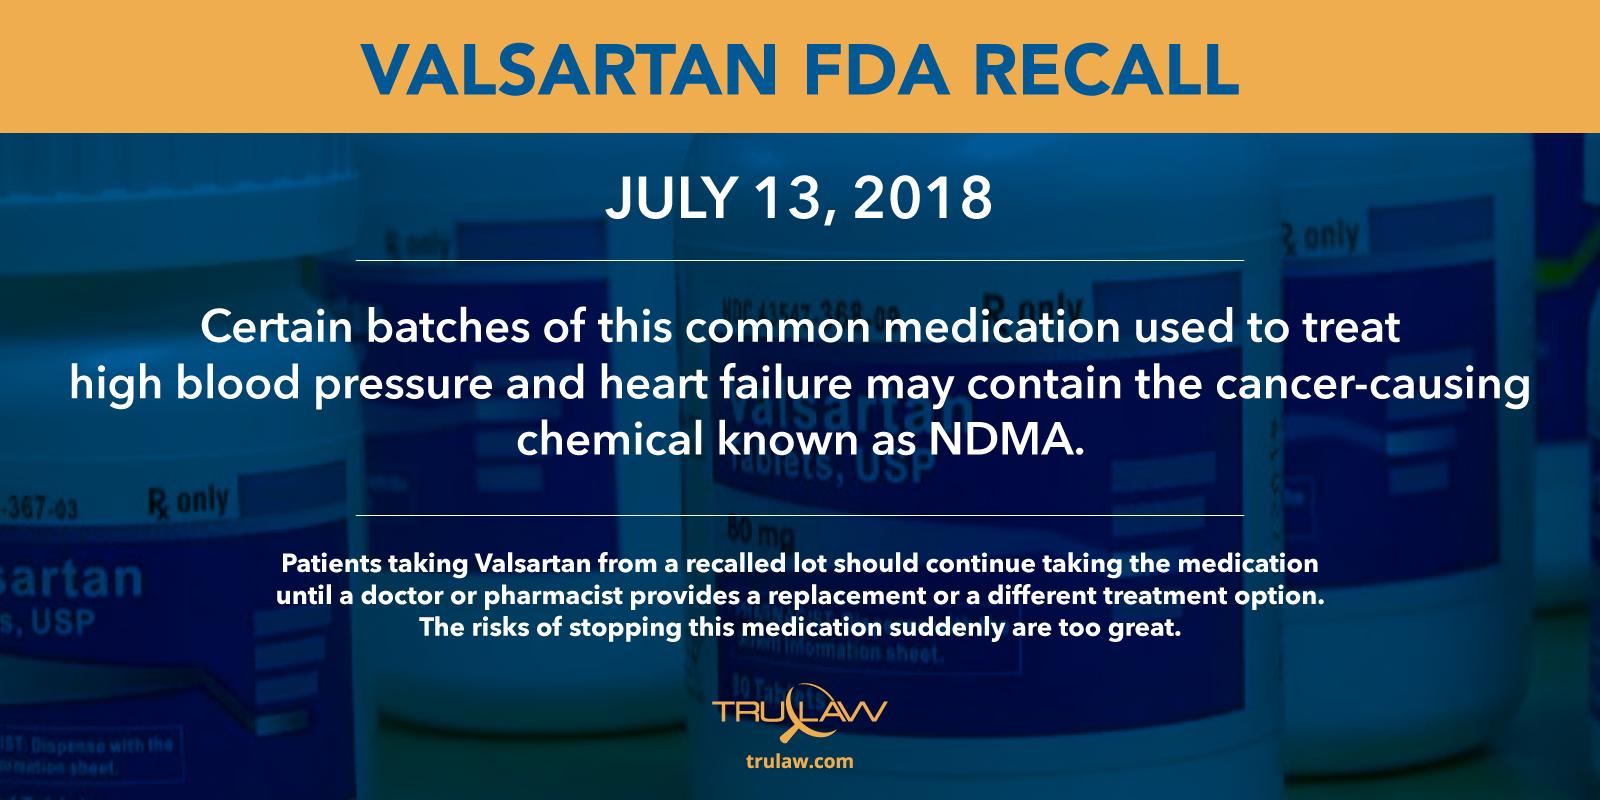 Valsartan-Lawsuits-FDA-Recall-Infographic